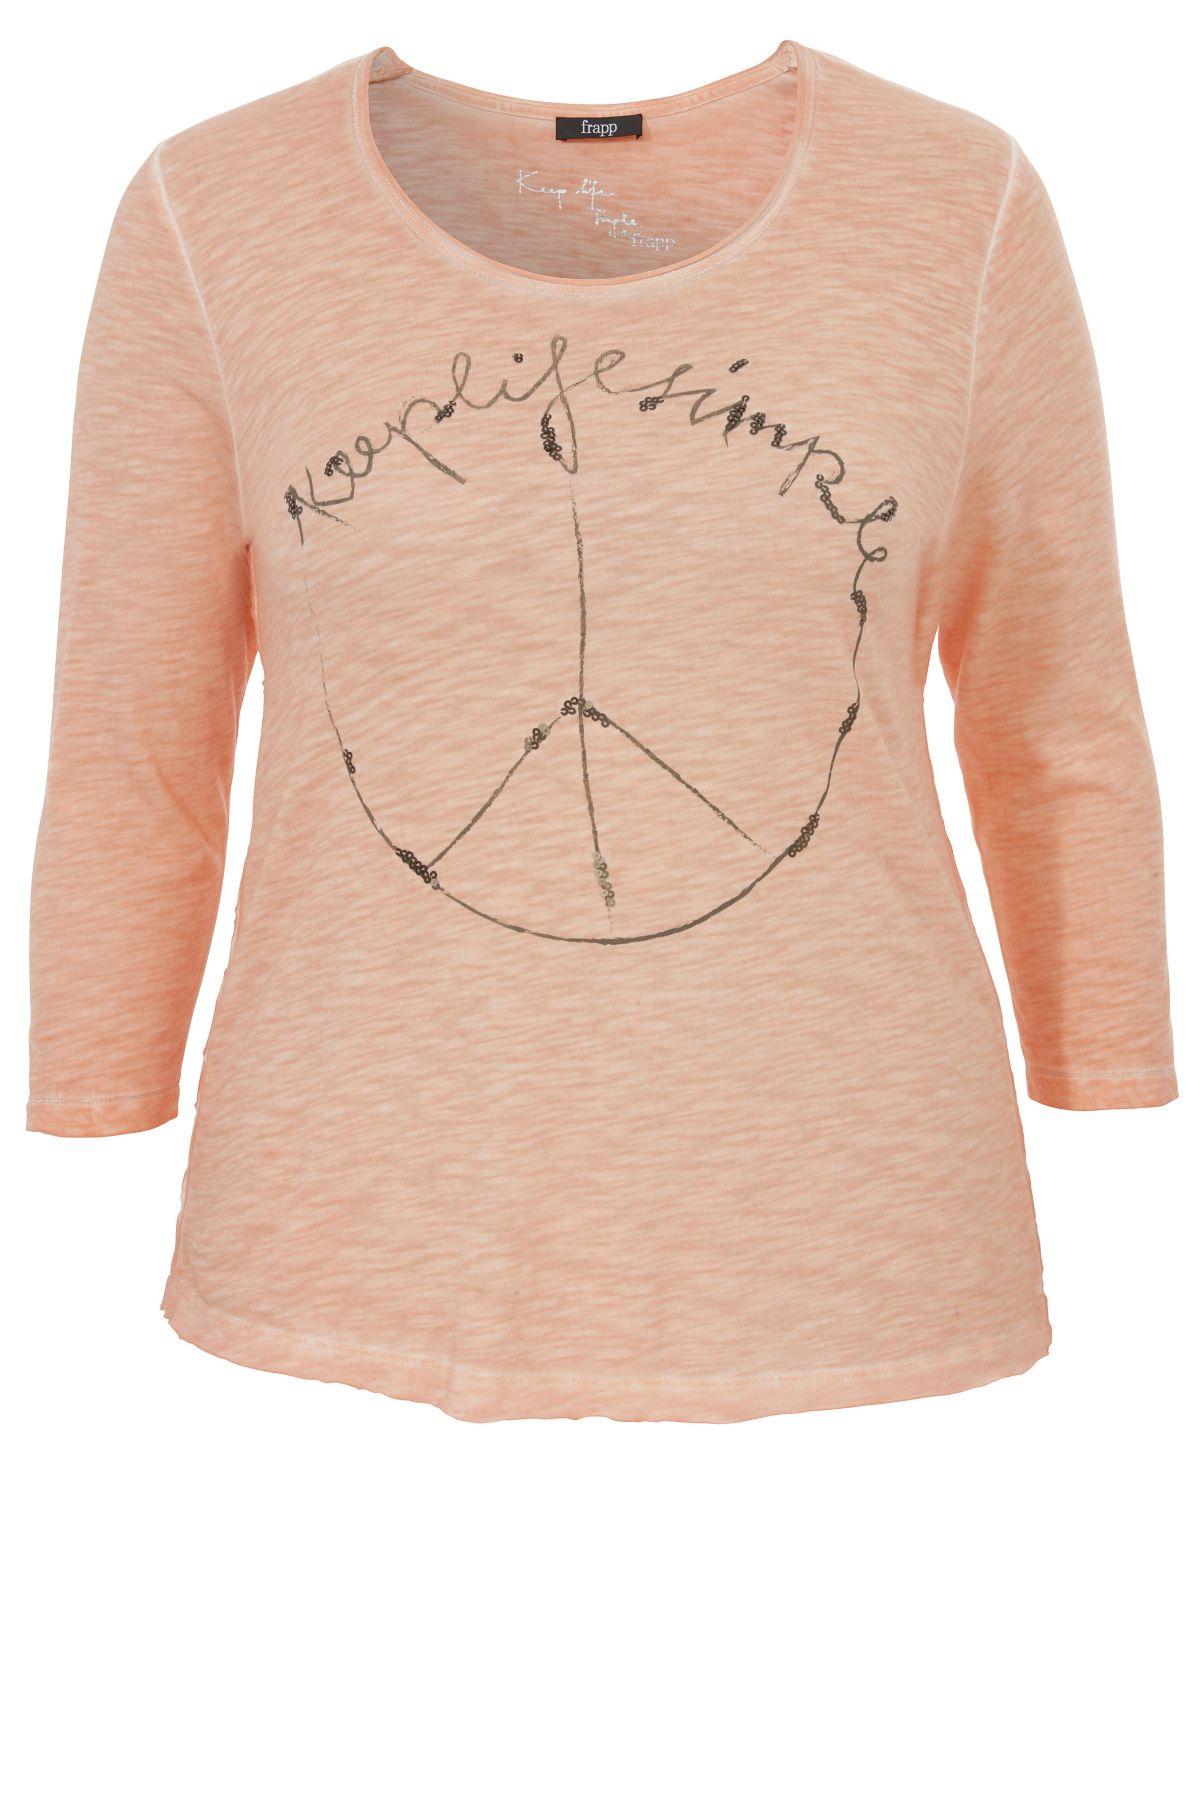 FRAPP Shirt mit Peace-Motiv